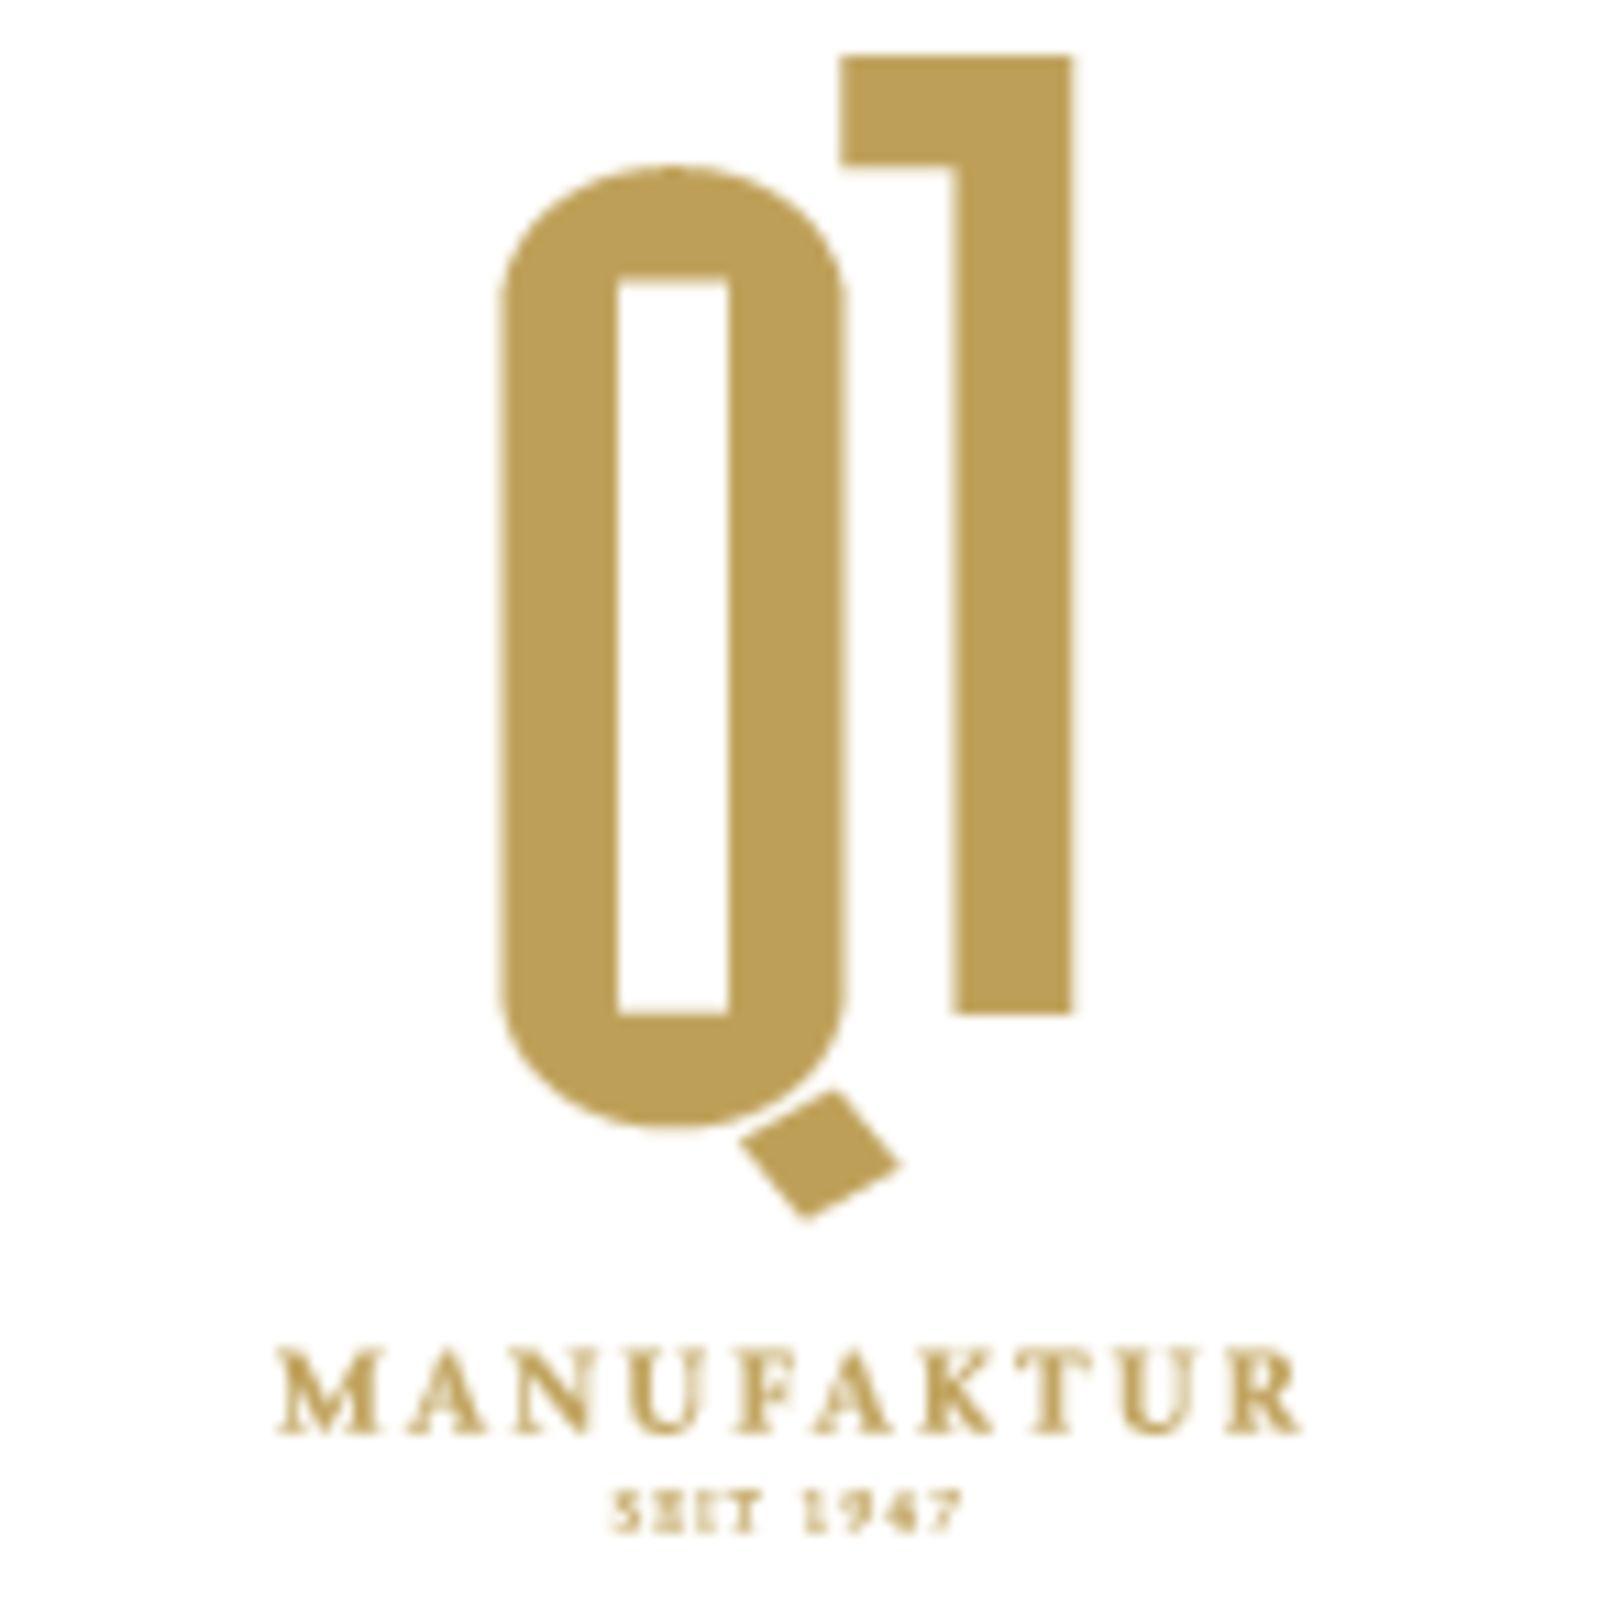 Q1 MANUFAKTUR